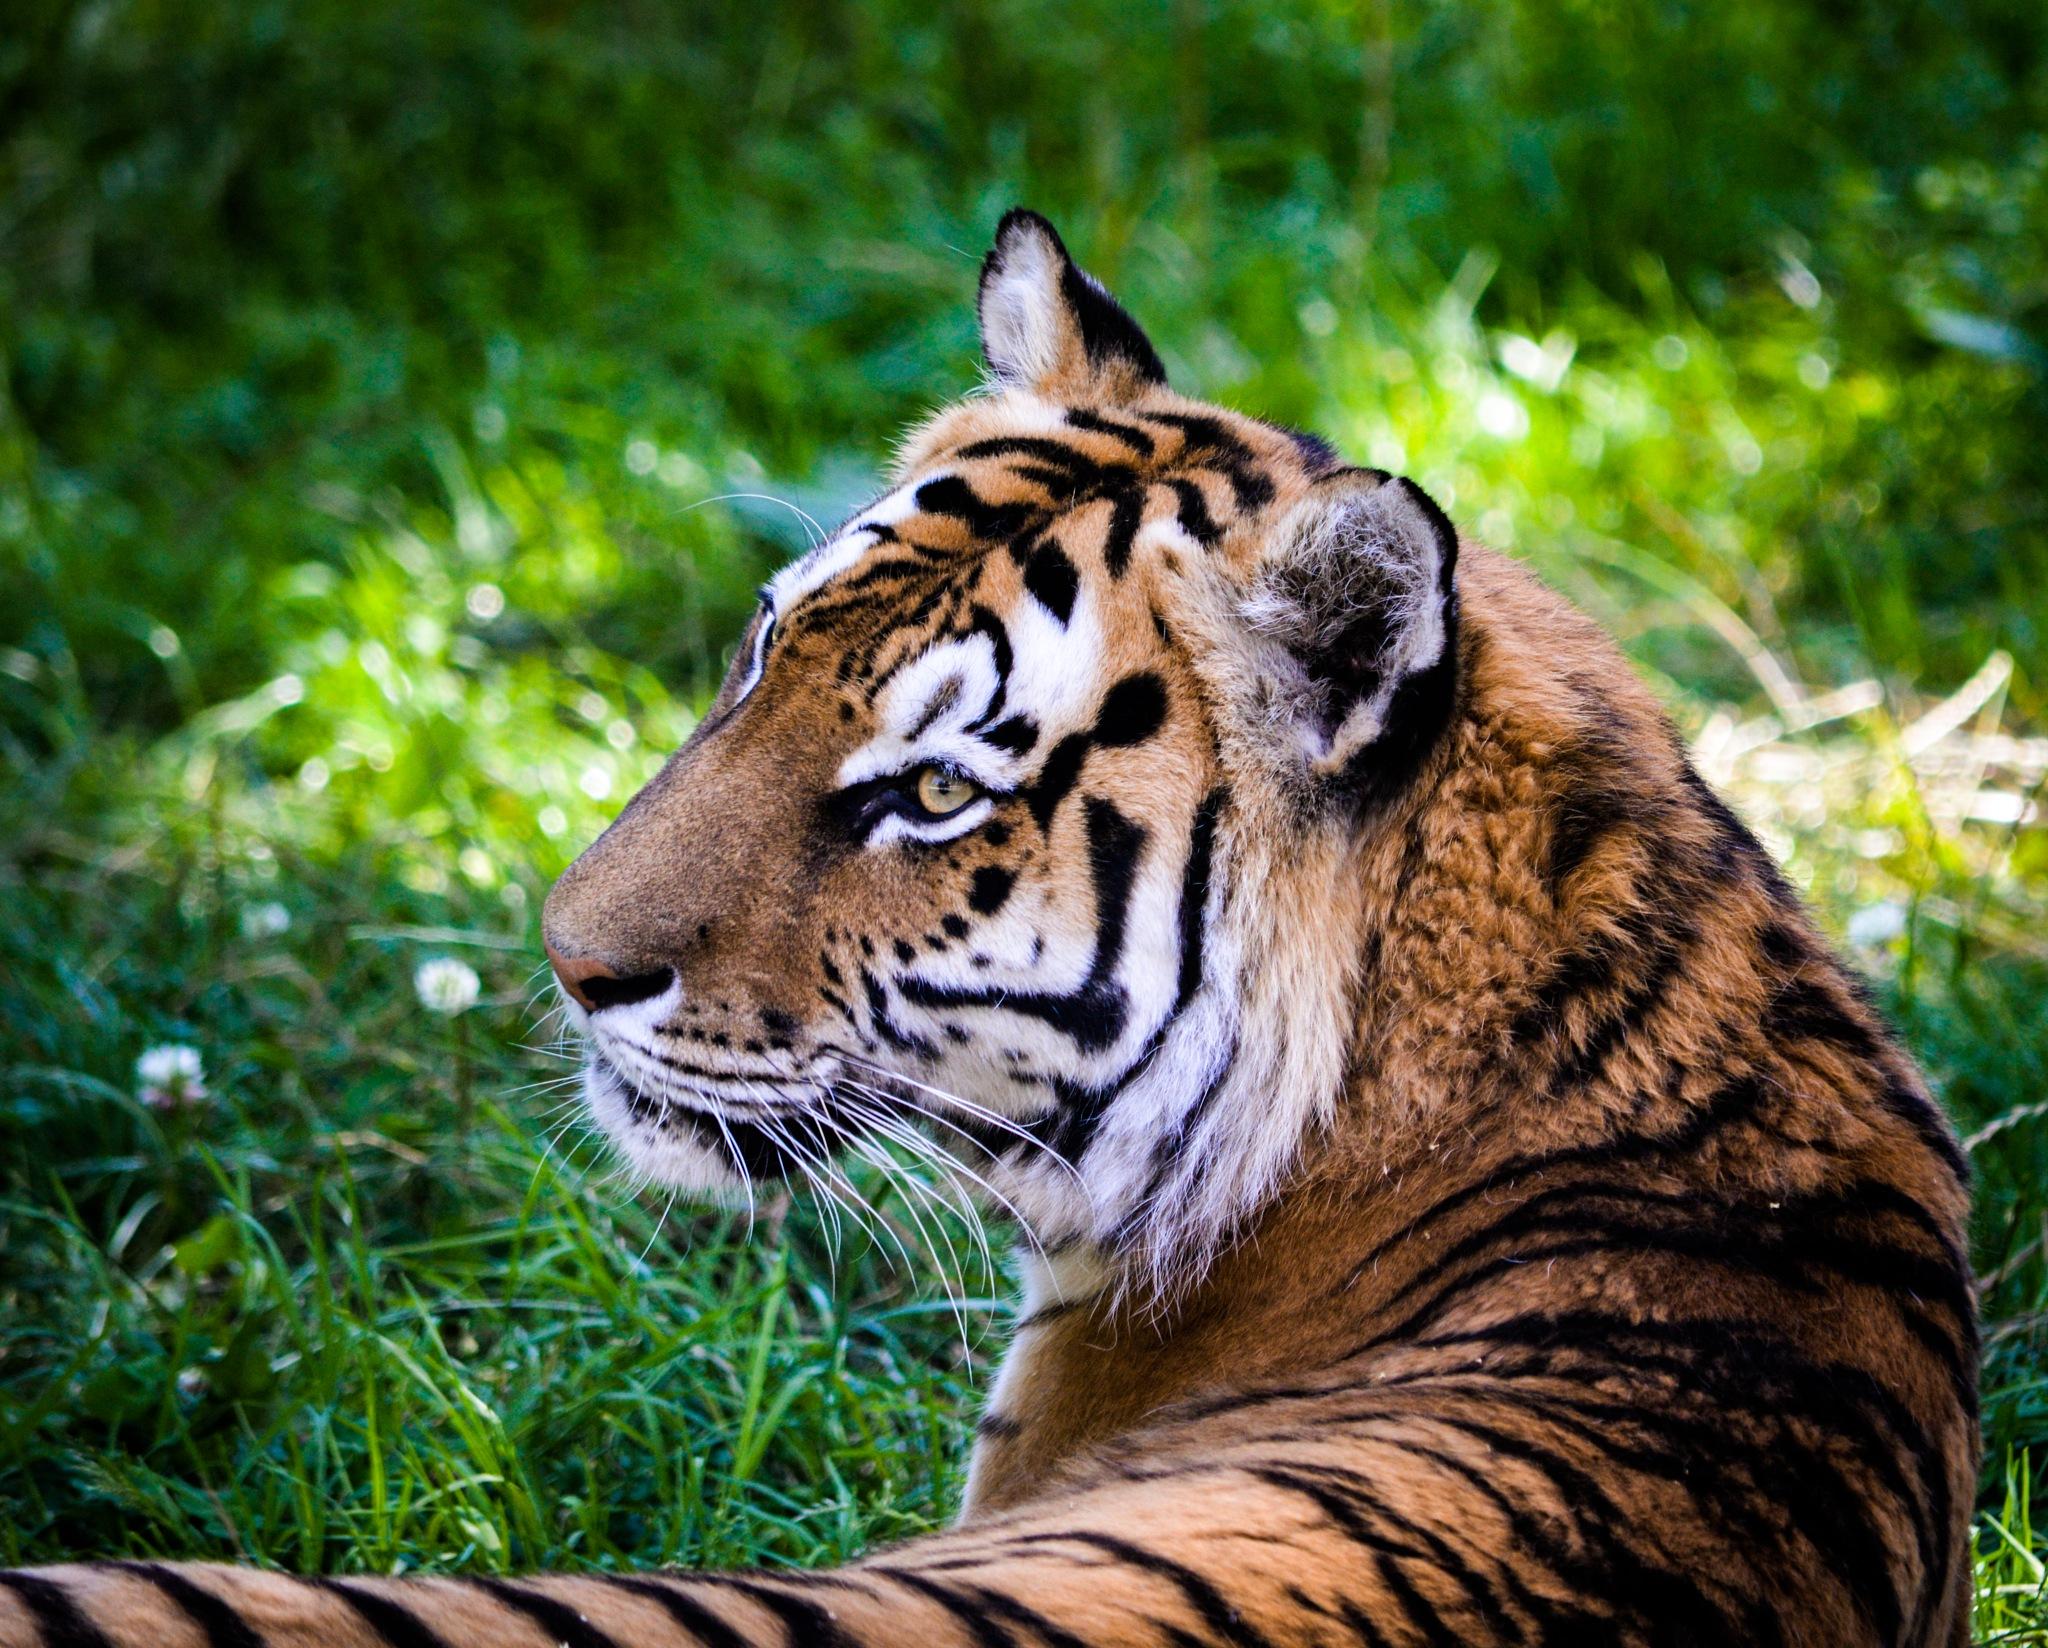 Tiger by Joakim Nilsson